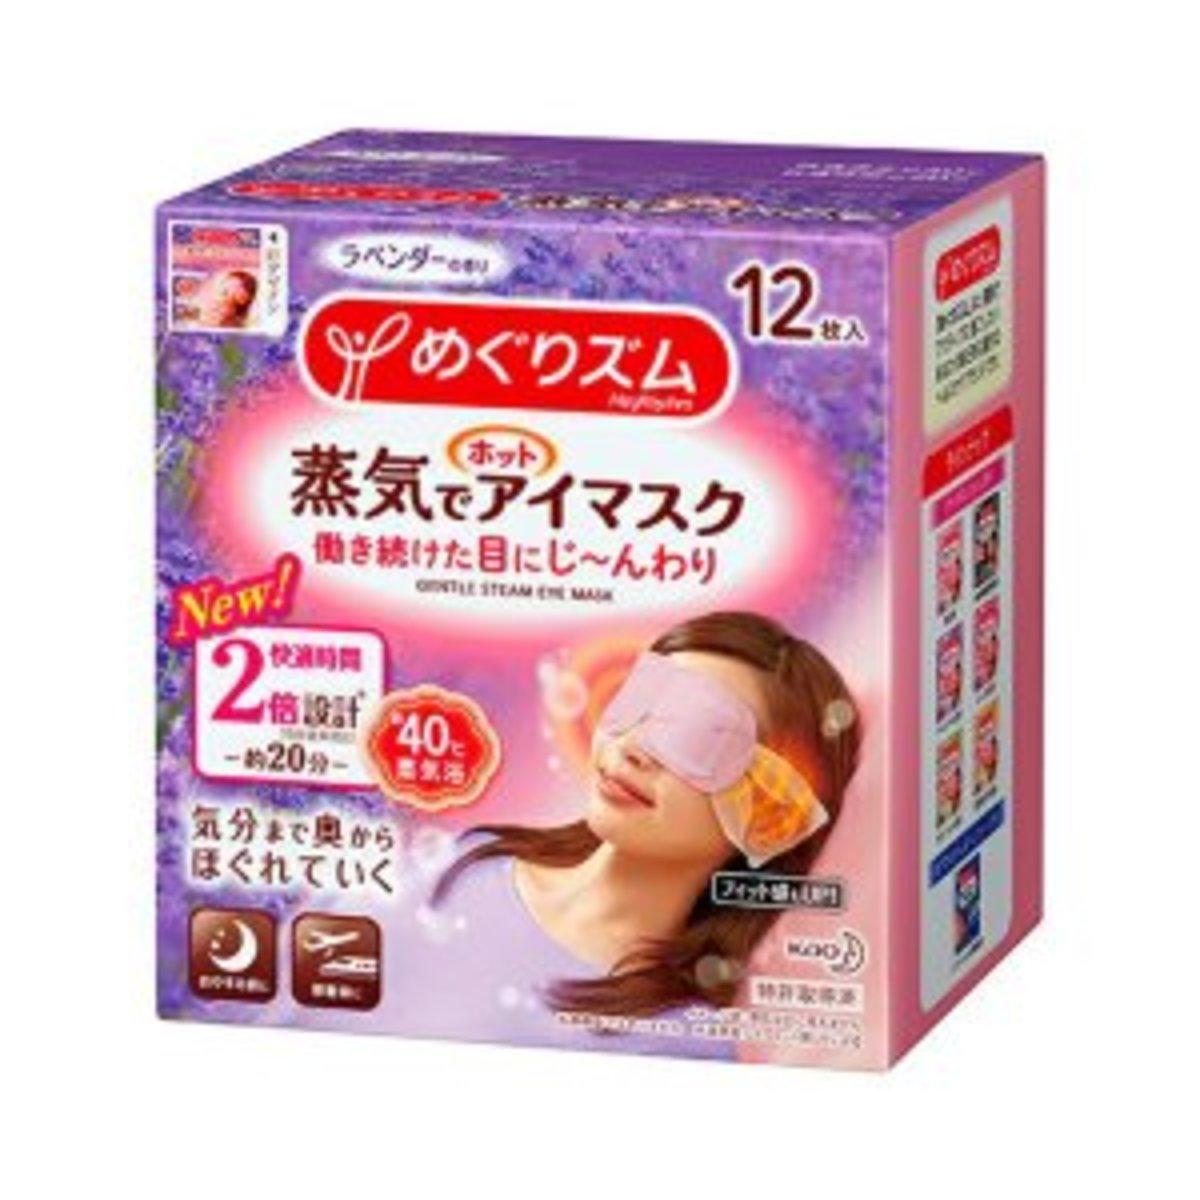 (2018 New Version) MegRhythm Steam Eye Mask (Lavender) 12pcs